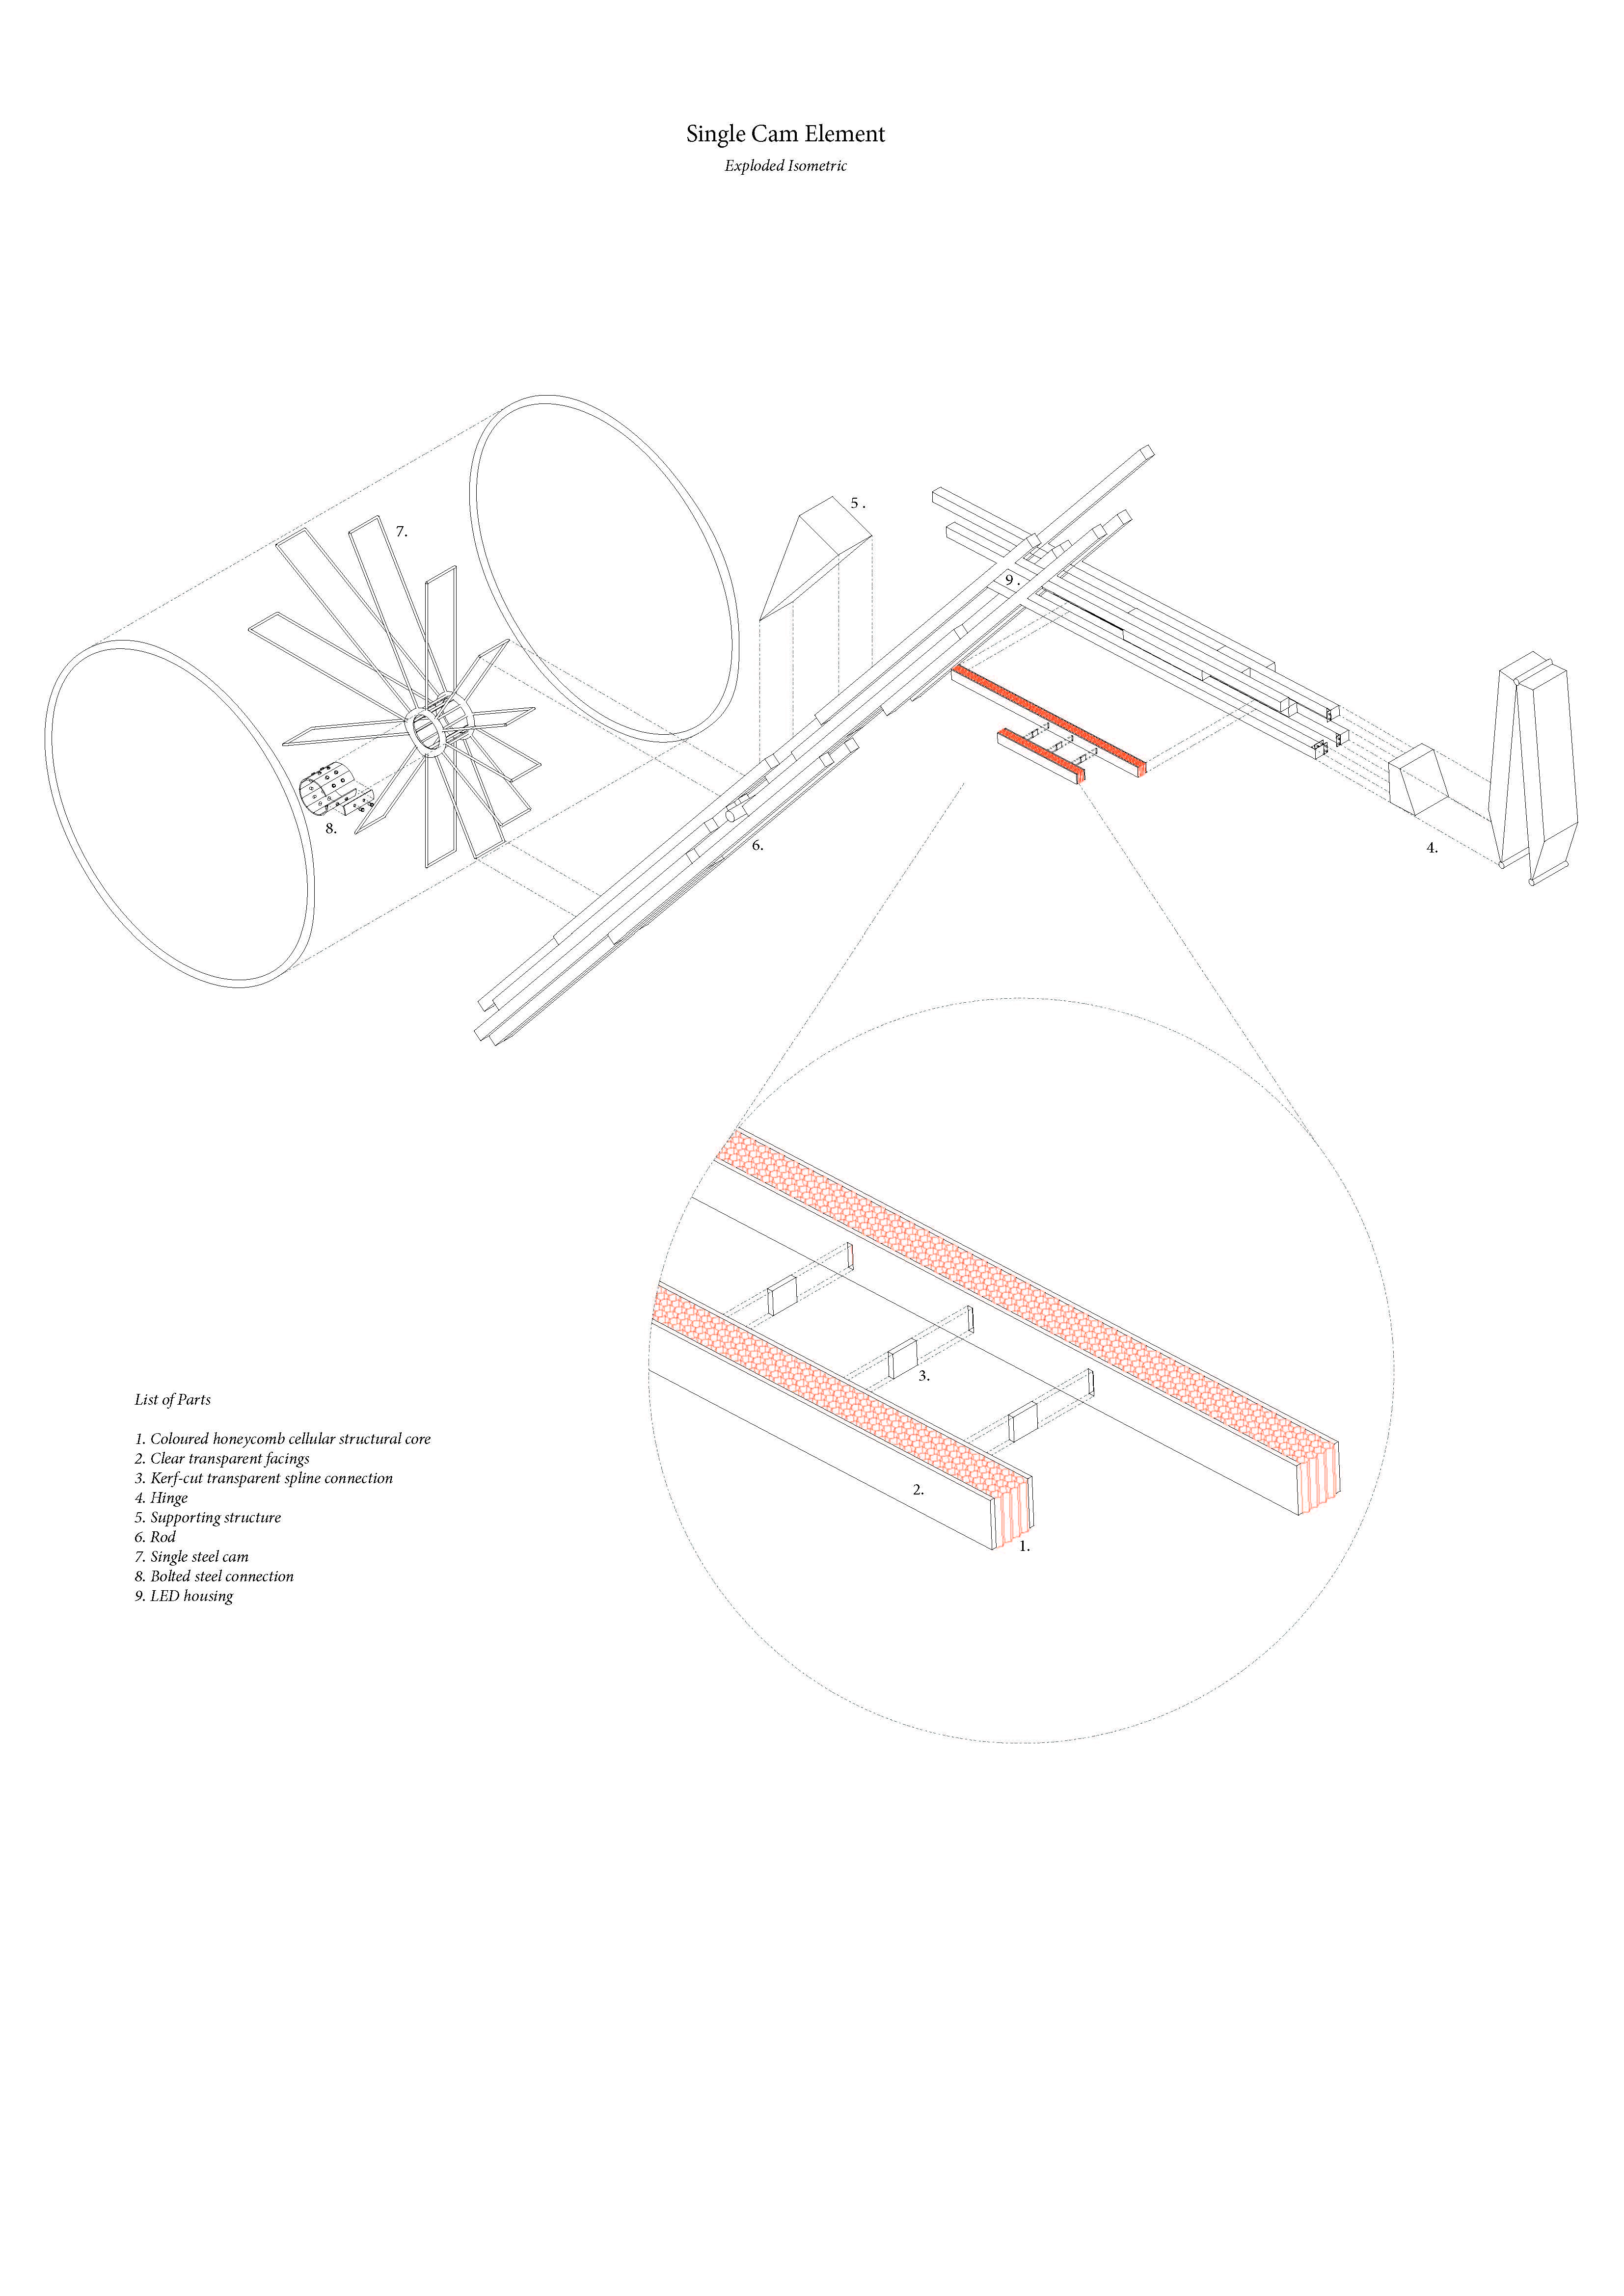 20170203 - Frank - Phase 2 - Element Plates 04